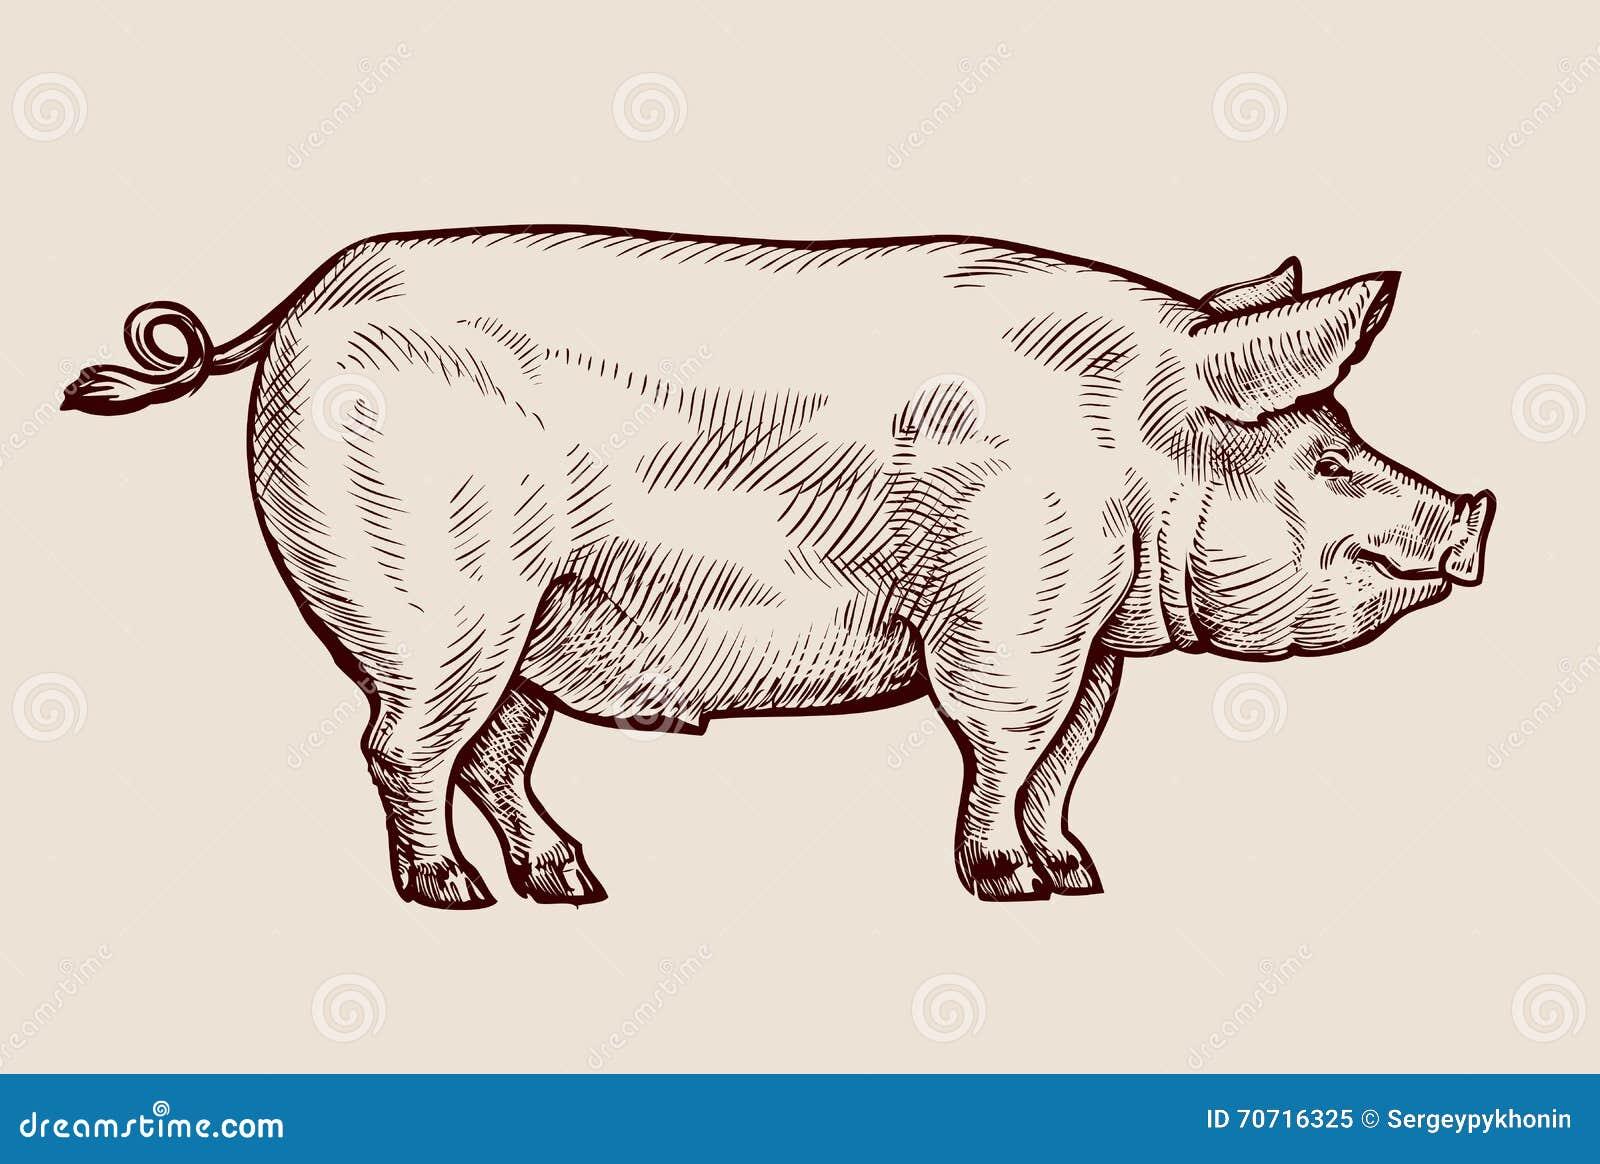 Sketch Pig. Hand-drawn Vector Illustration Stock Vector